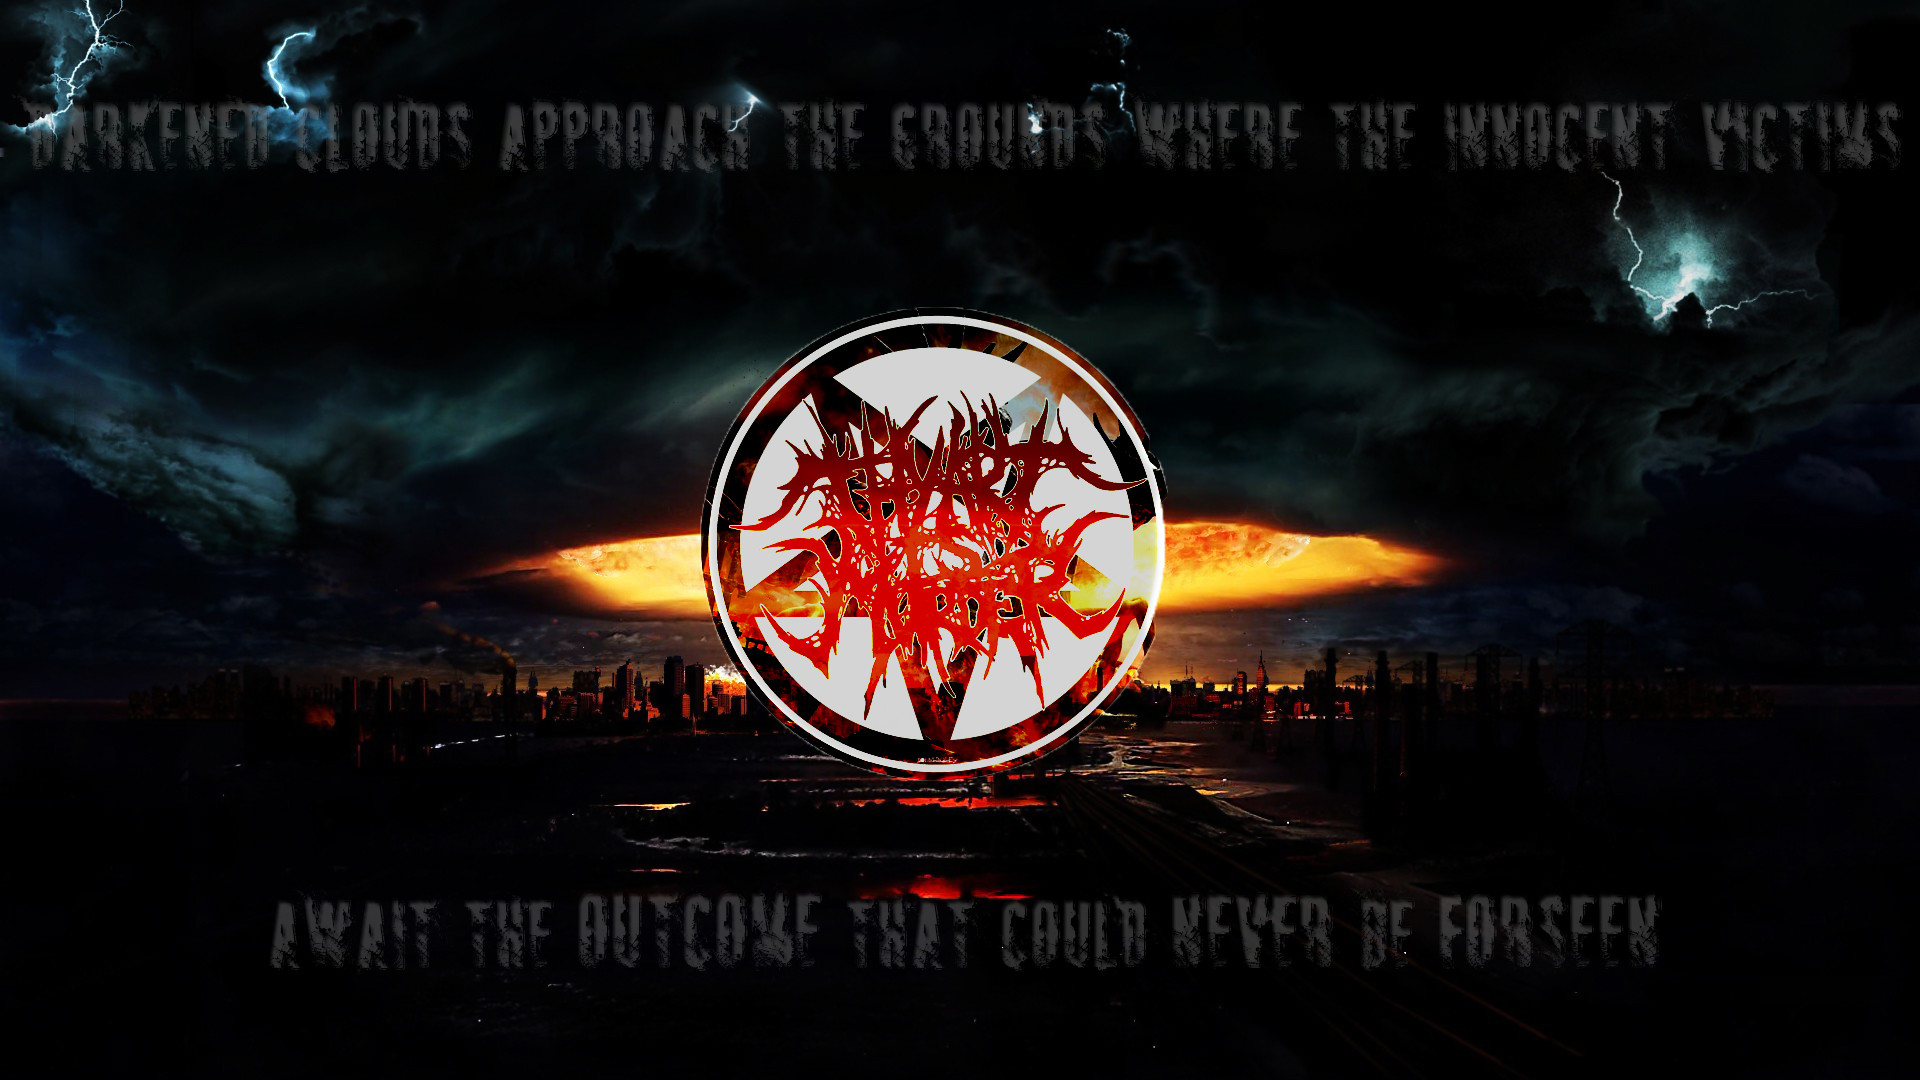 Pentagram Band Wallpaper – Visit Chile